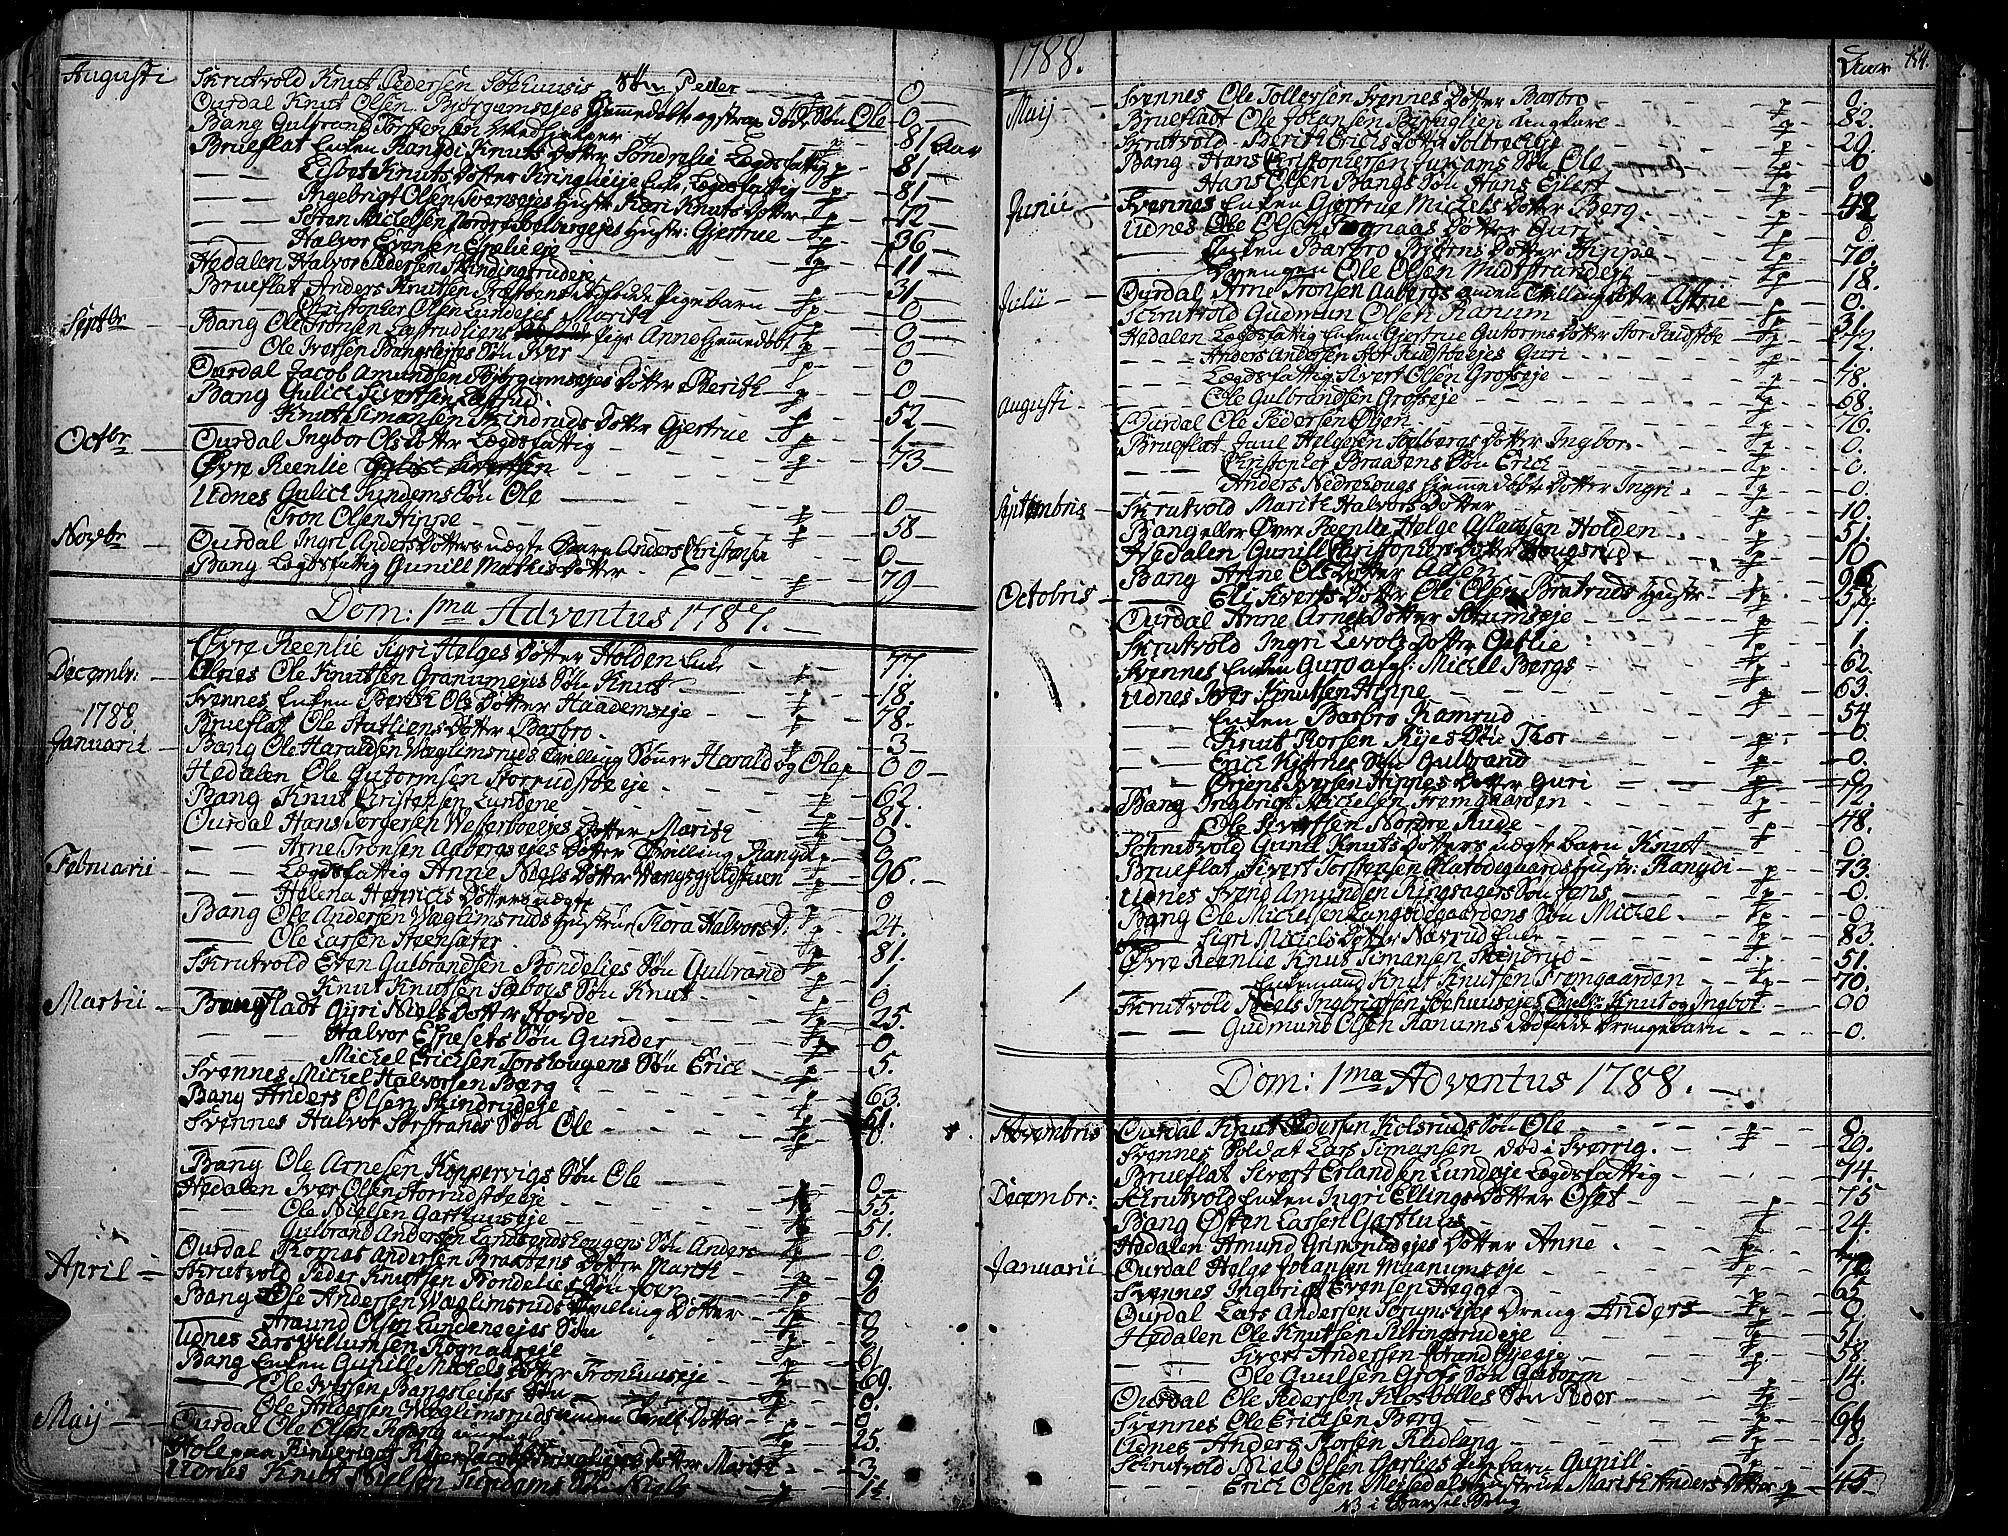 SAH, Aurdal prestekontor, Ministerialbok nr. 6, 1781-1804, s. 154